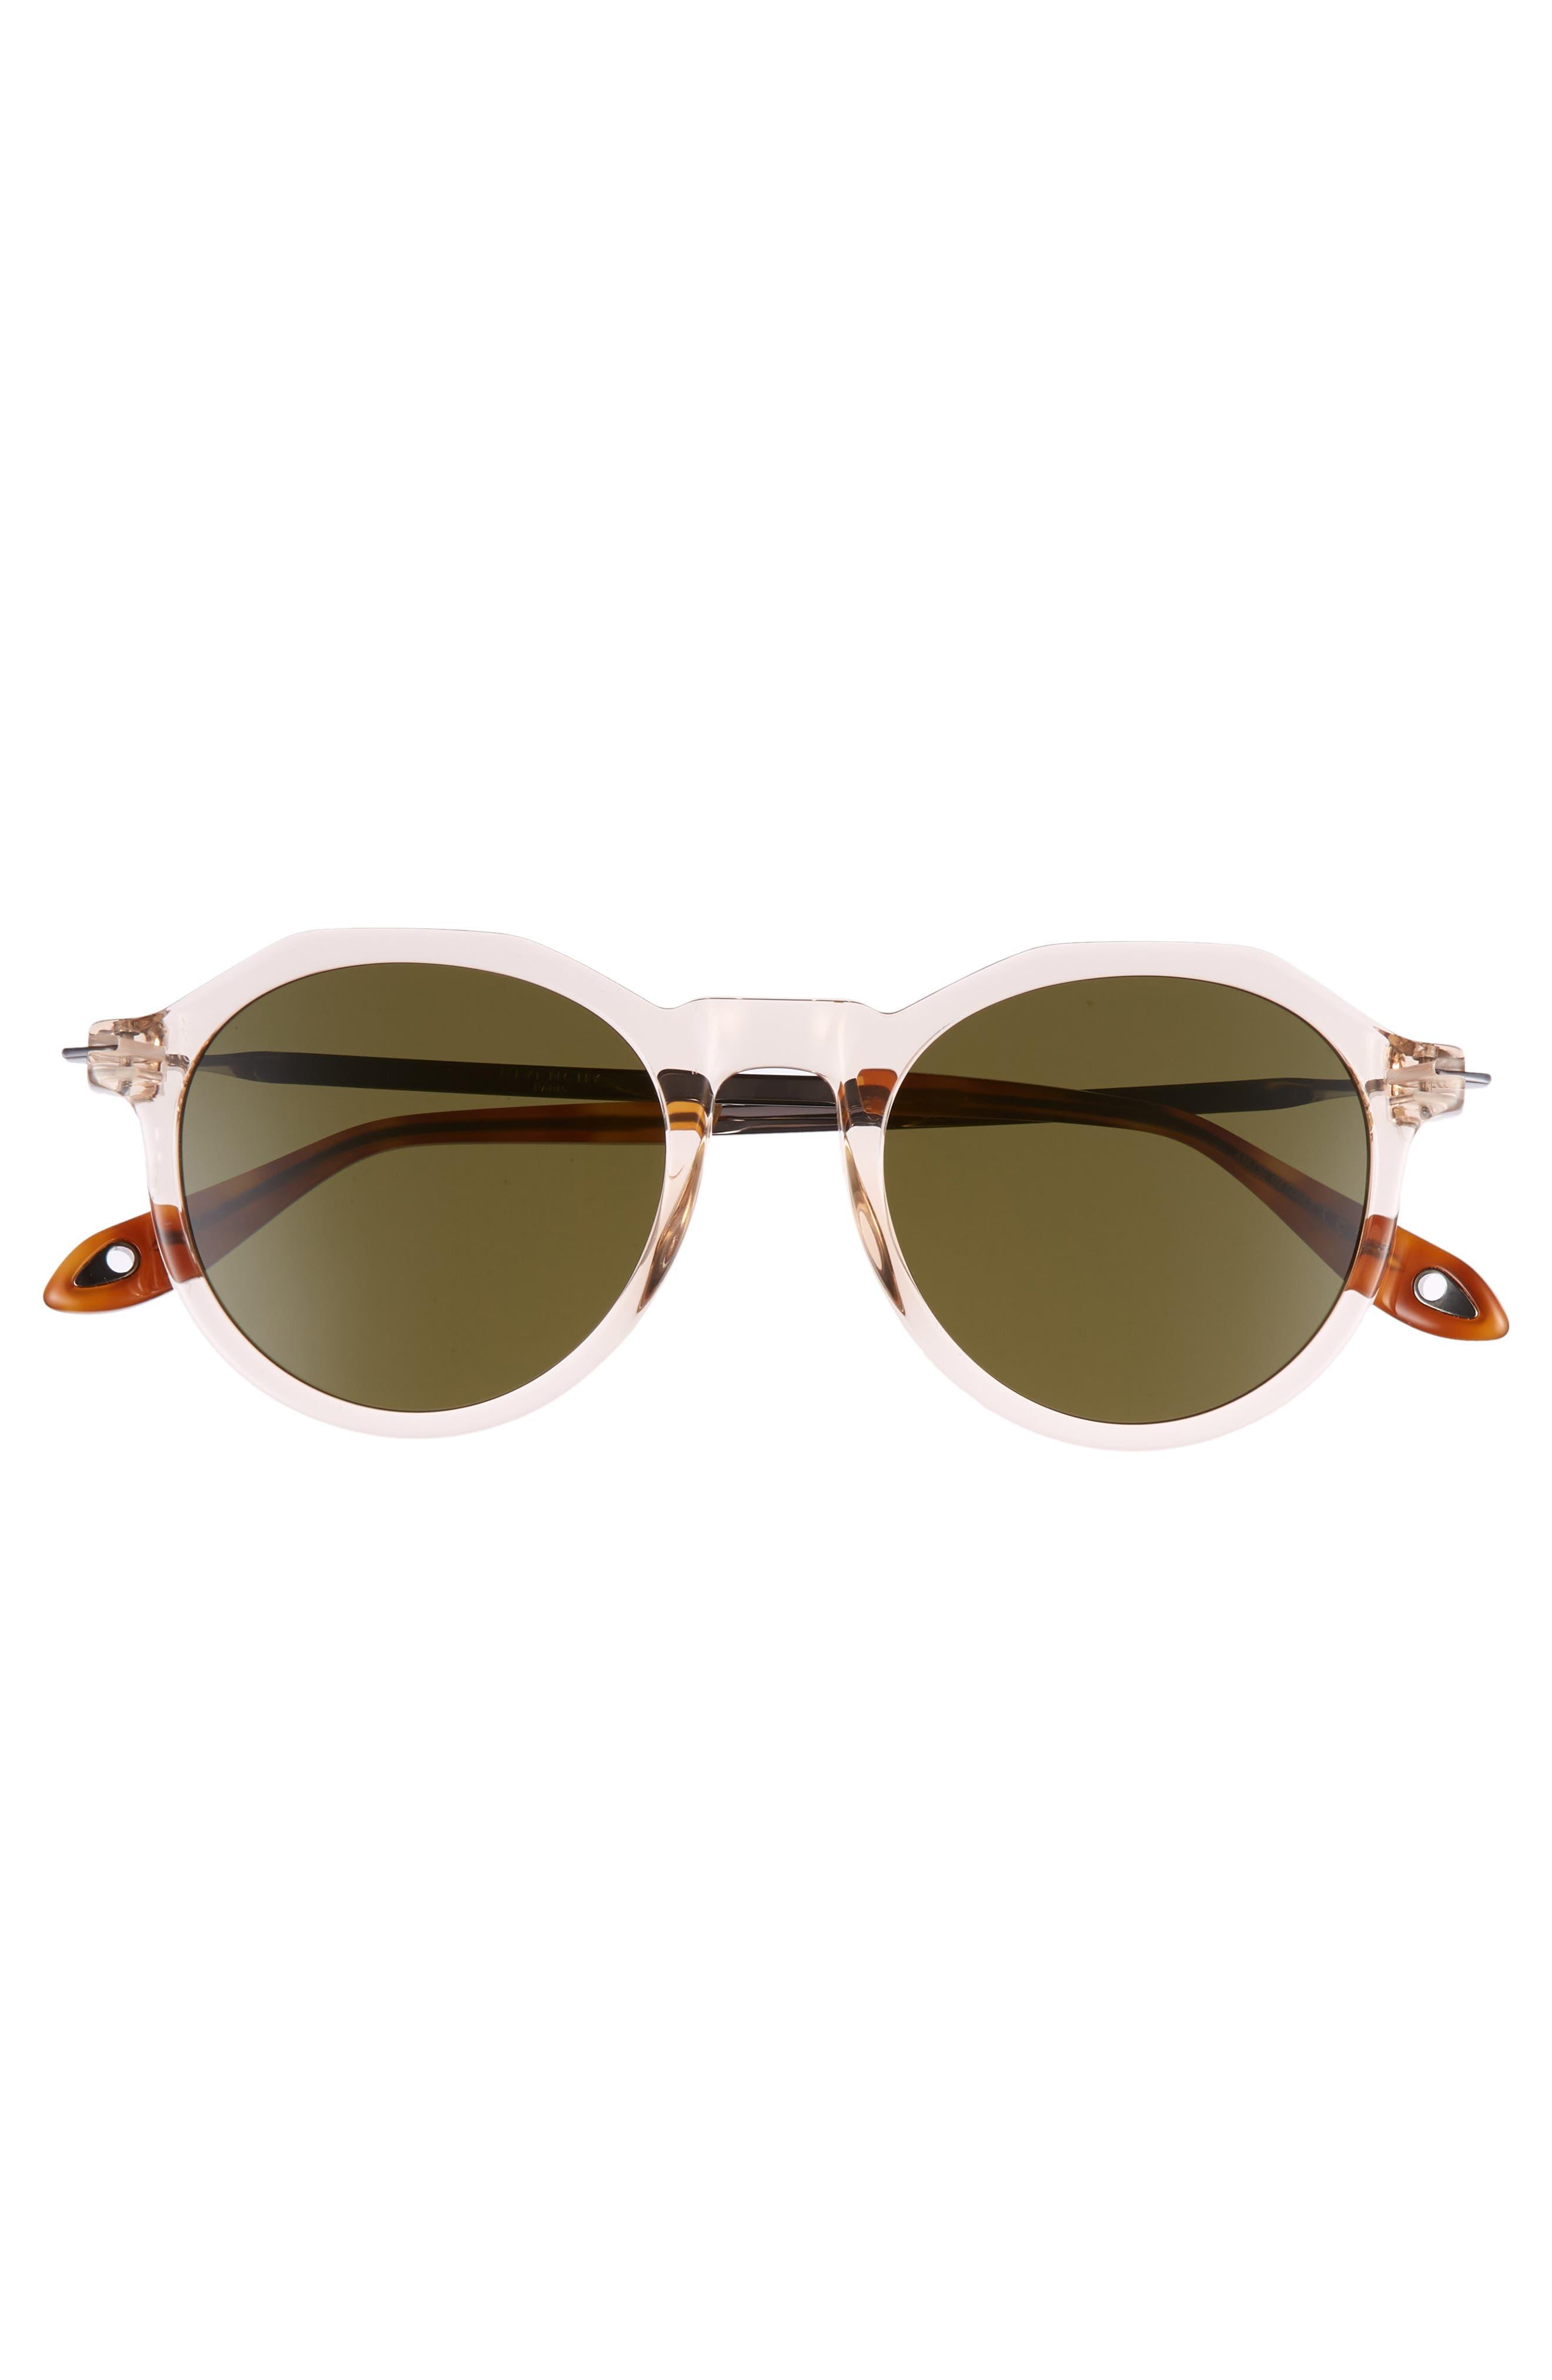 51mm Round Sunglasses,                             Alternate thumbnail 9, color,